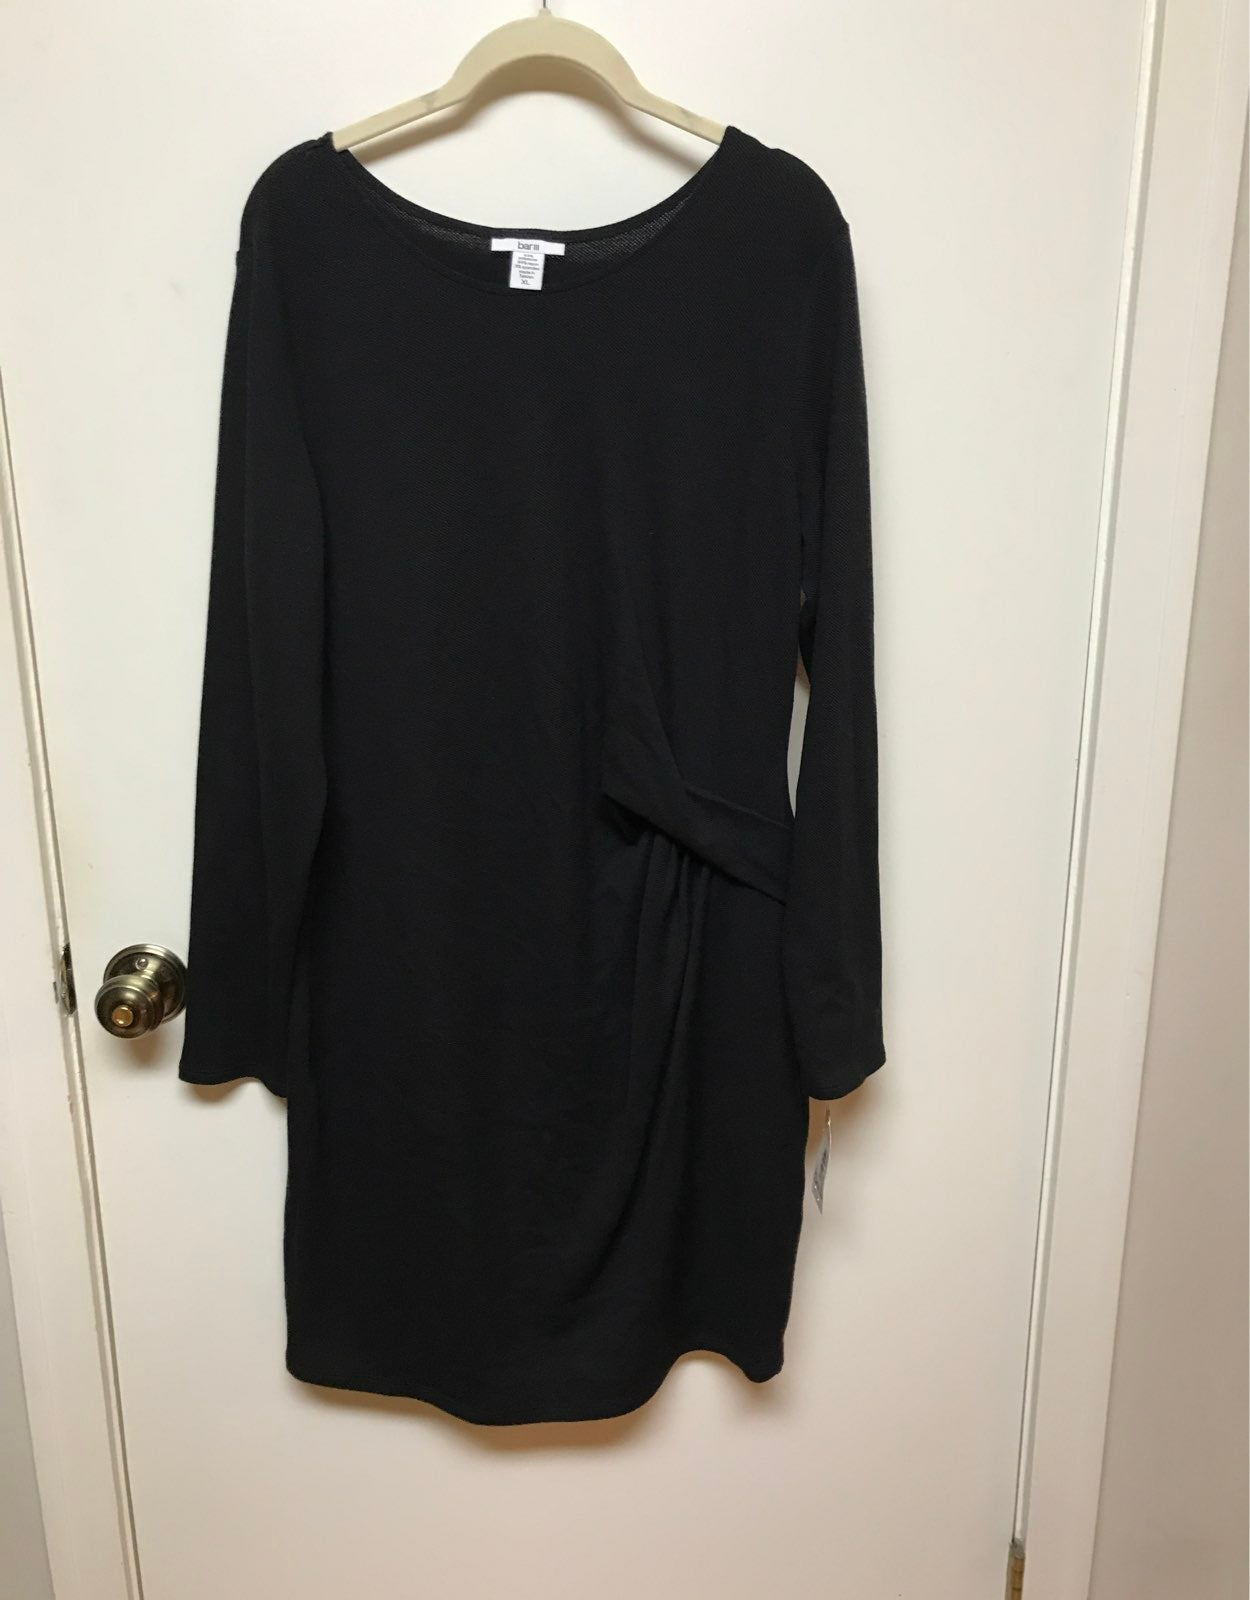 NWT Bar III black Dress XL